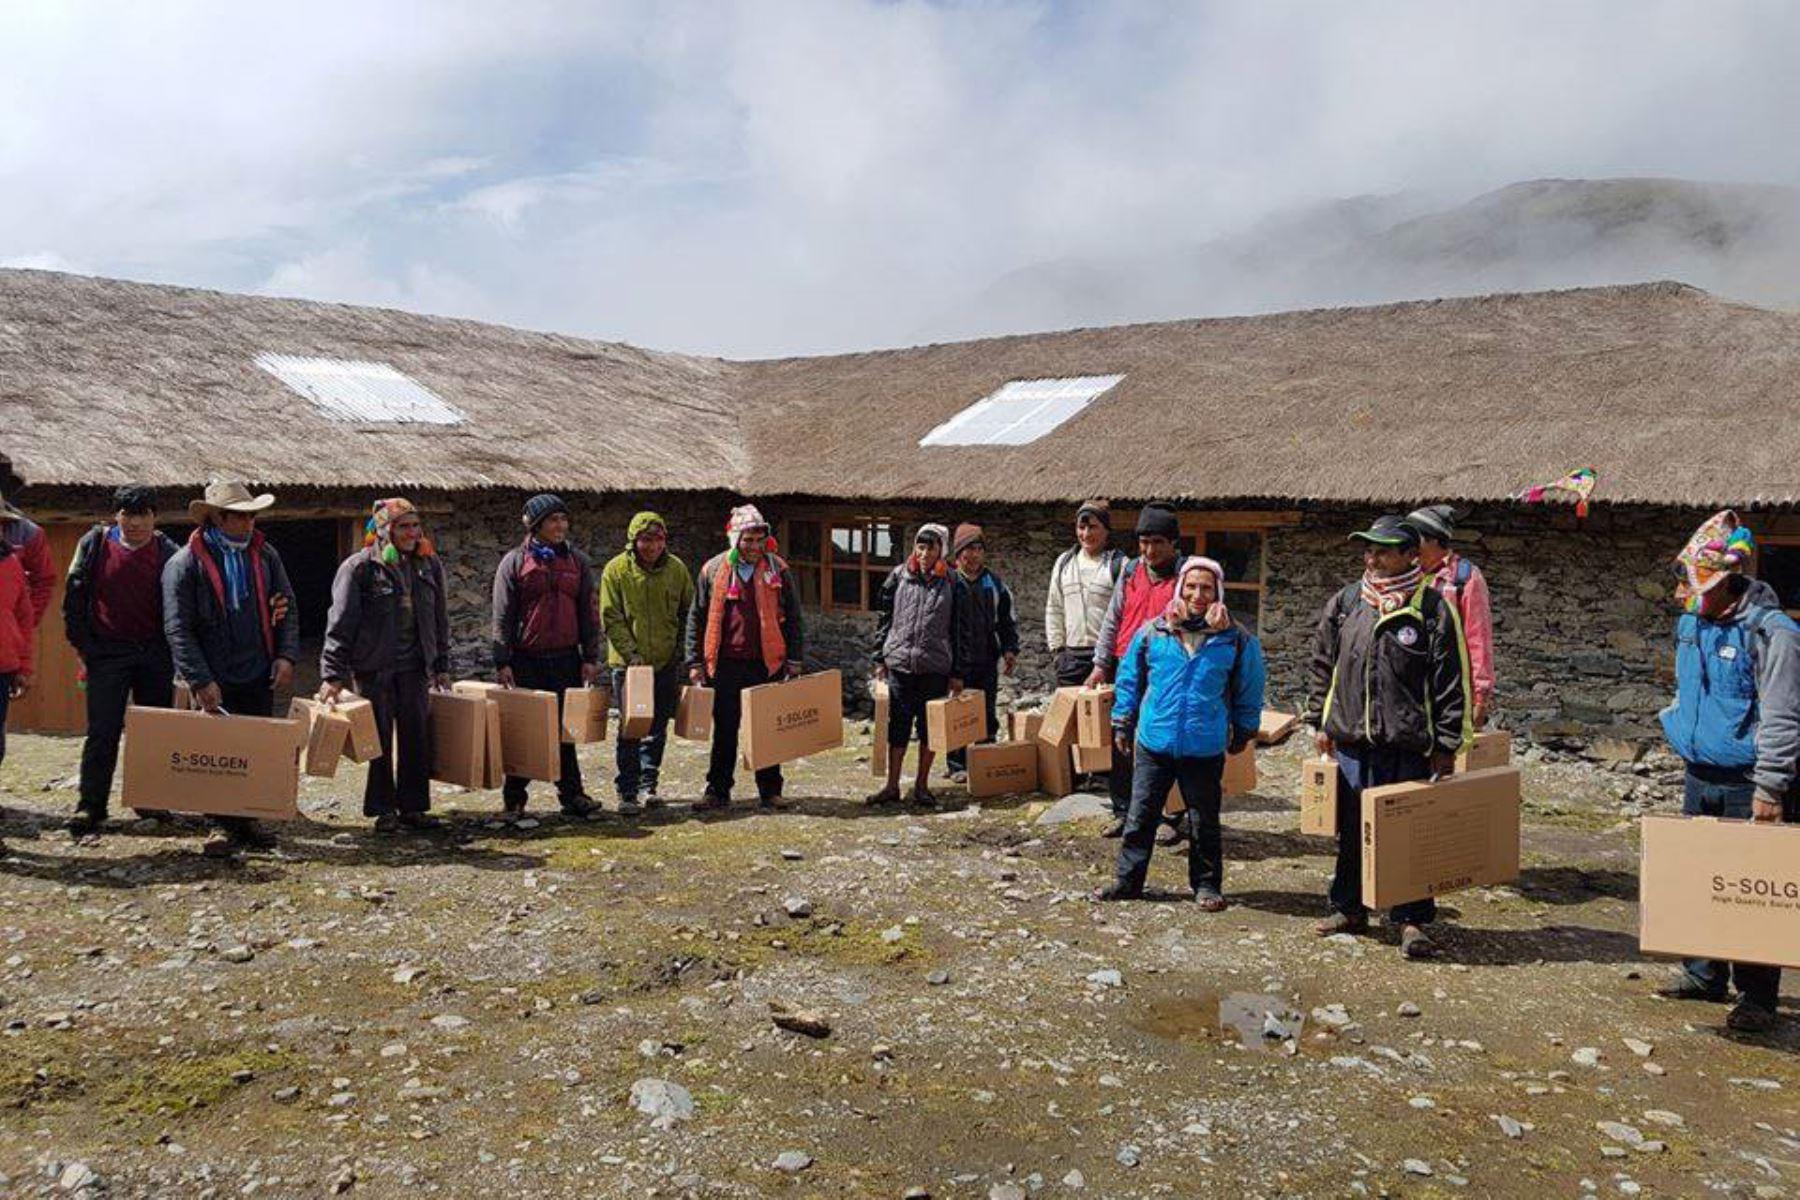 Con paneles solares comunidades indígenas Q'ero, de Cusco, acceden a energía eléctrica ANDINA